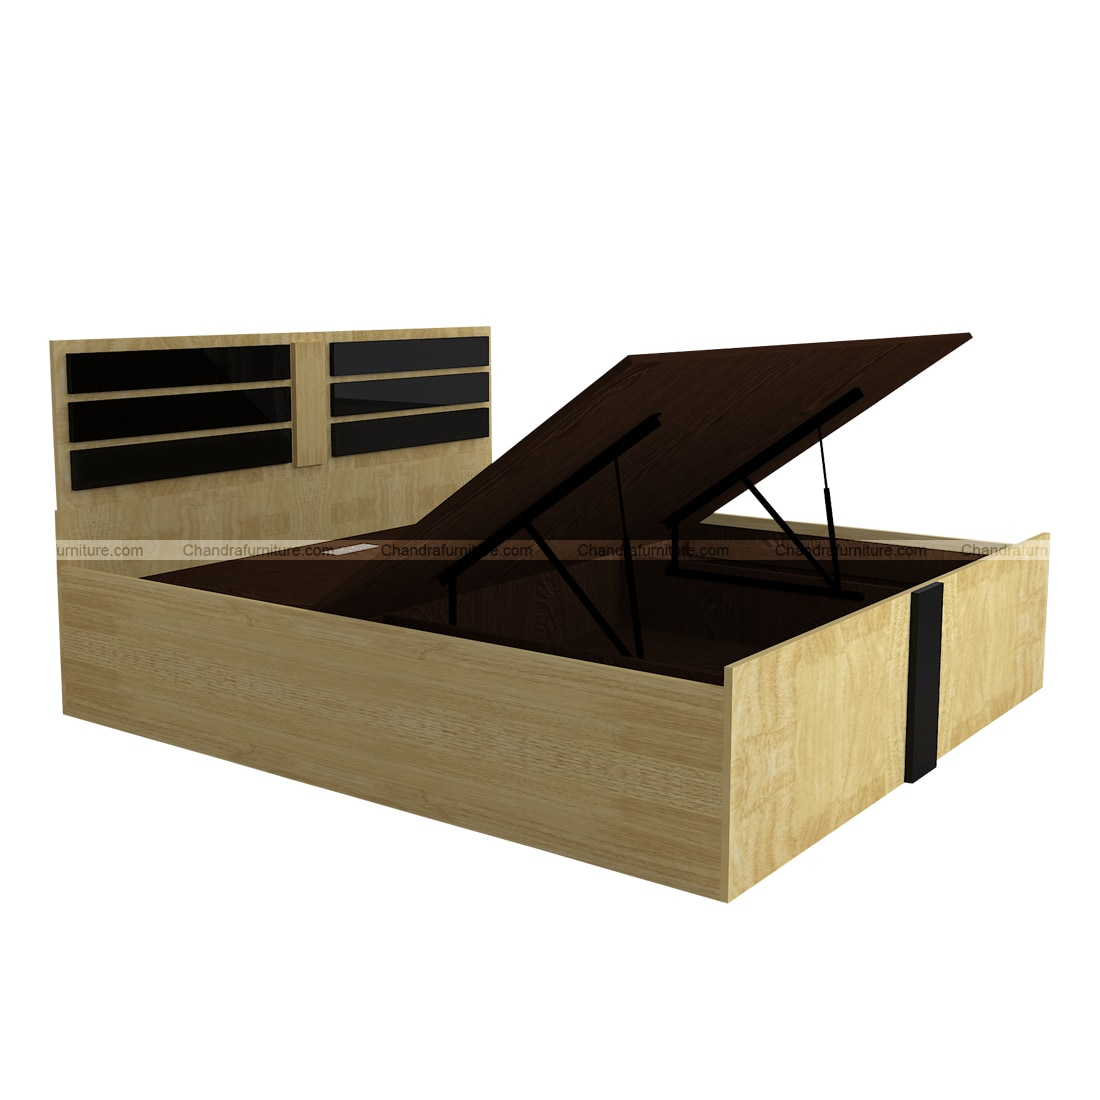 Chandra Furniture King Size Bed - Diamond